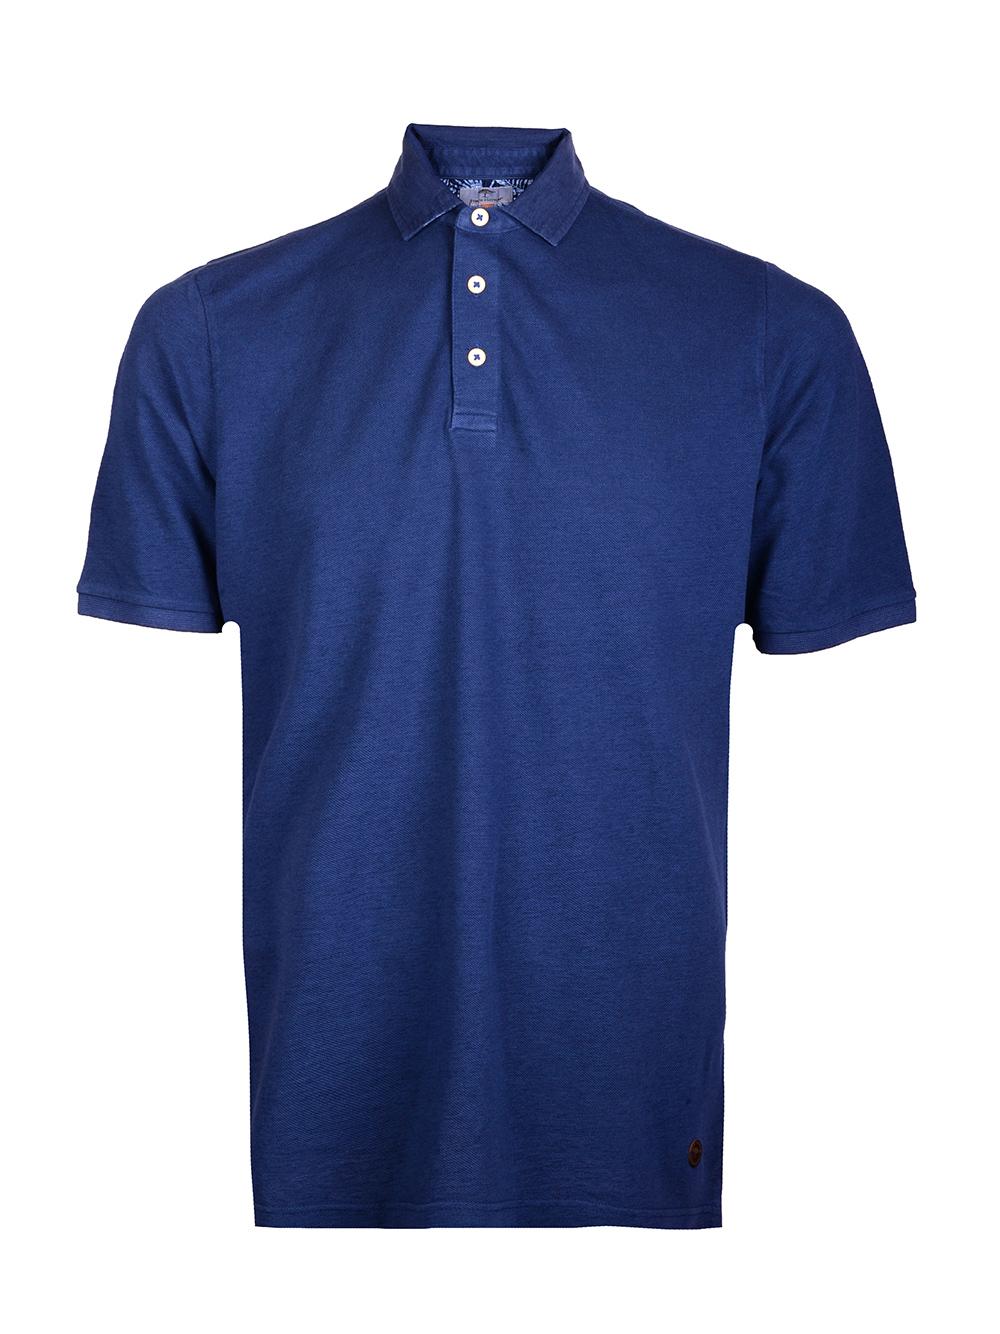 FYNCH-HATTON Μπλούζα Polo 1120 1792-672 ΜΠΛΕ